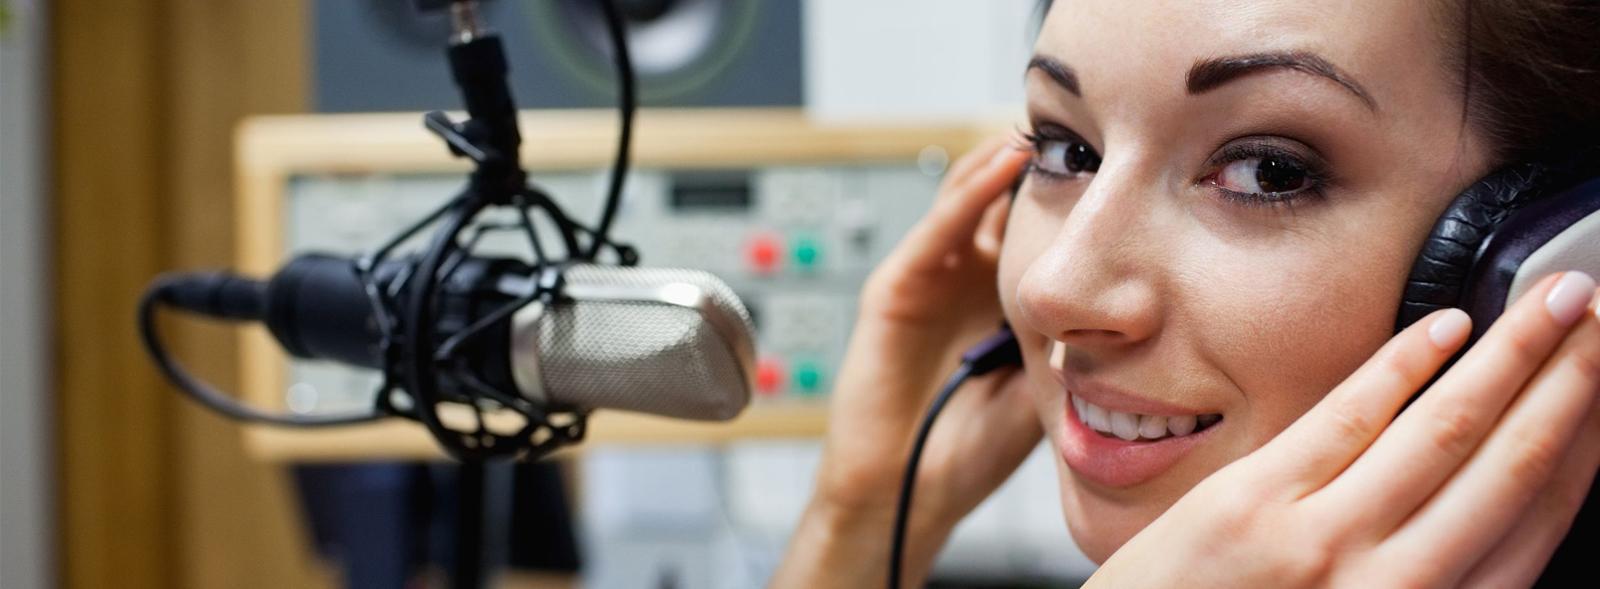 IGLESIA EVANGELICA CRISTIANA - RADIO FM NUEVA VIDA 104.5